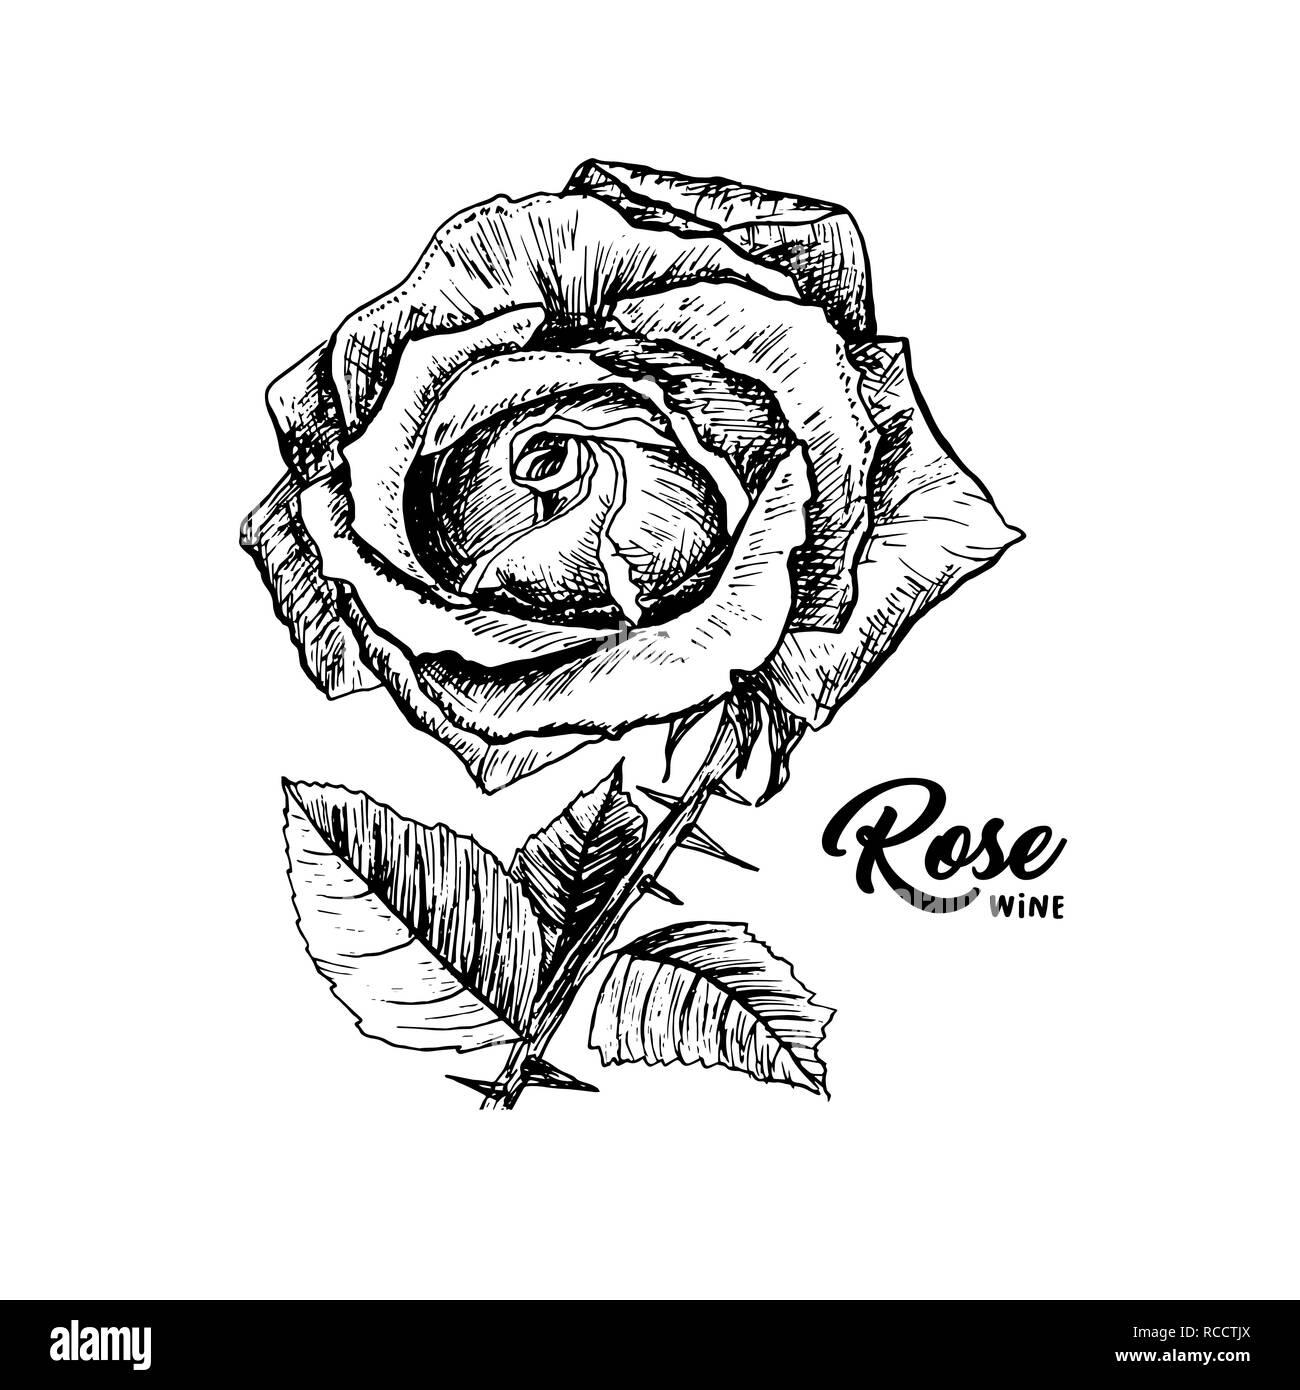 Rose Wine Flower Hand Drawn Vector Illustration Floral Ink Pen Clipart Black And White Realistic Rosebud Outline Drawing Rose Wine Sketch With Lettering Logo Emblem Label Isolated Design Element Stock Vector Image